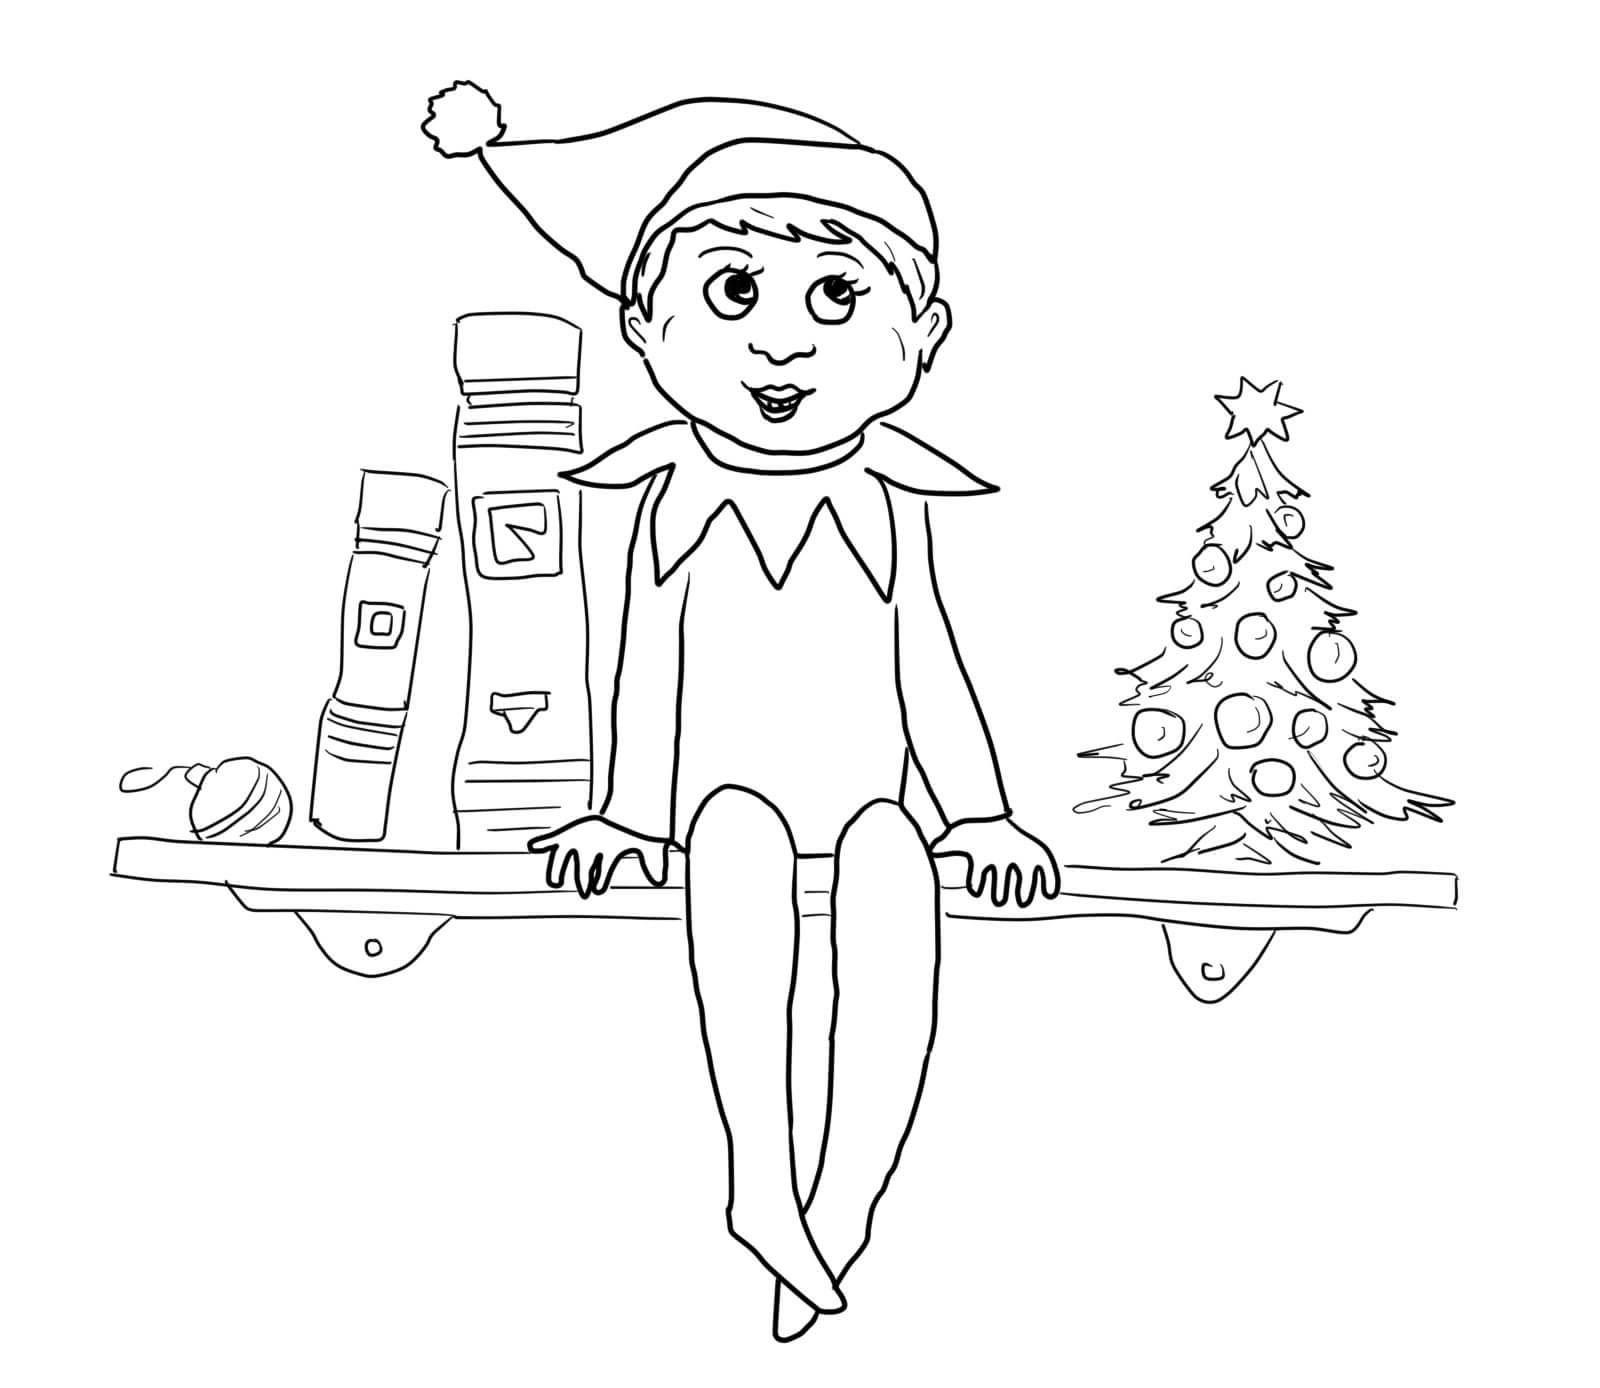 Elf on the Shelf Coloring Sheets Christmas  Educative Printable